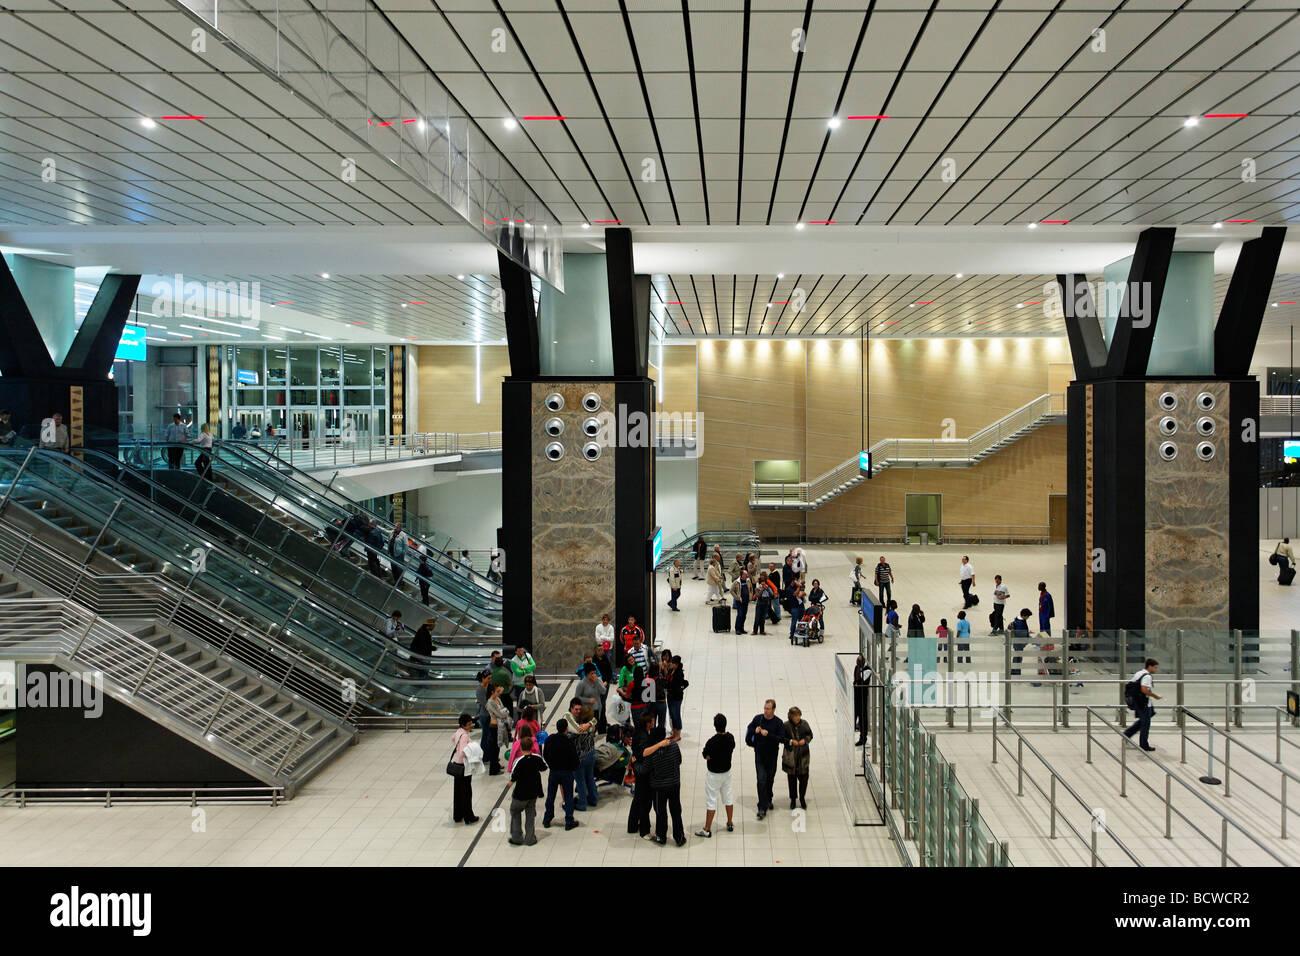 Handgepäck zu kontrollieren, Halle, O R Tambo International Airport, Johannesburg, Südafrika, Afrika Stockbild